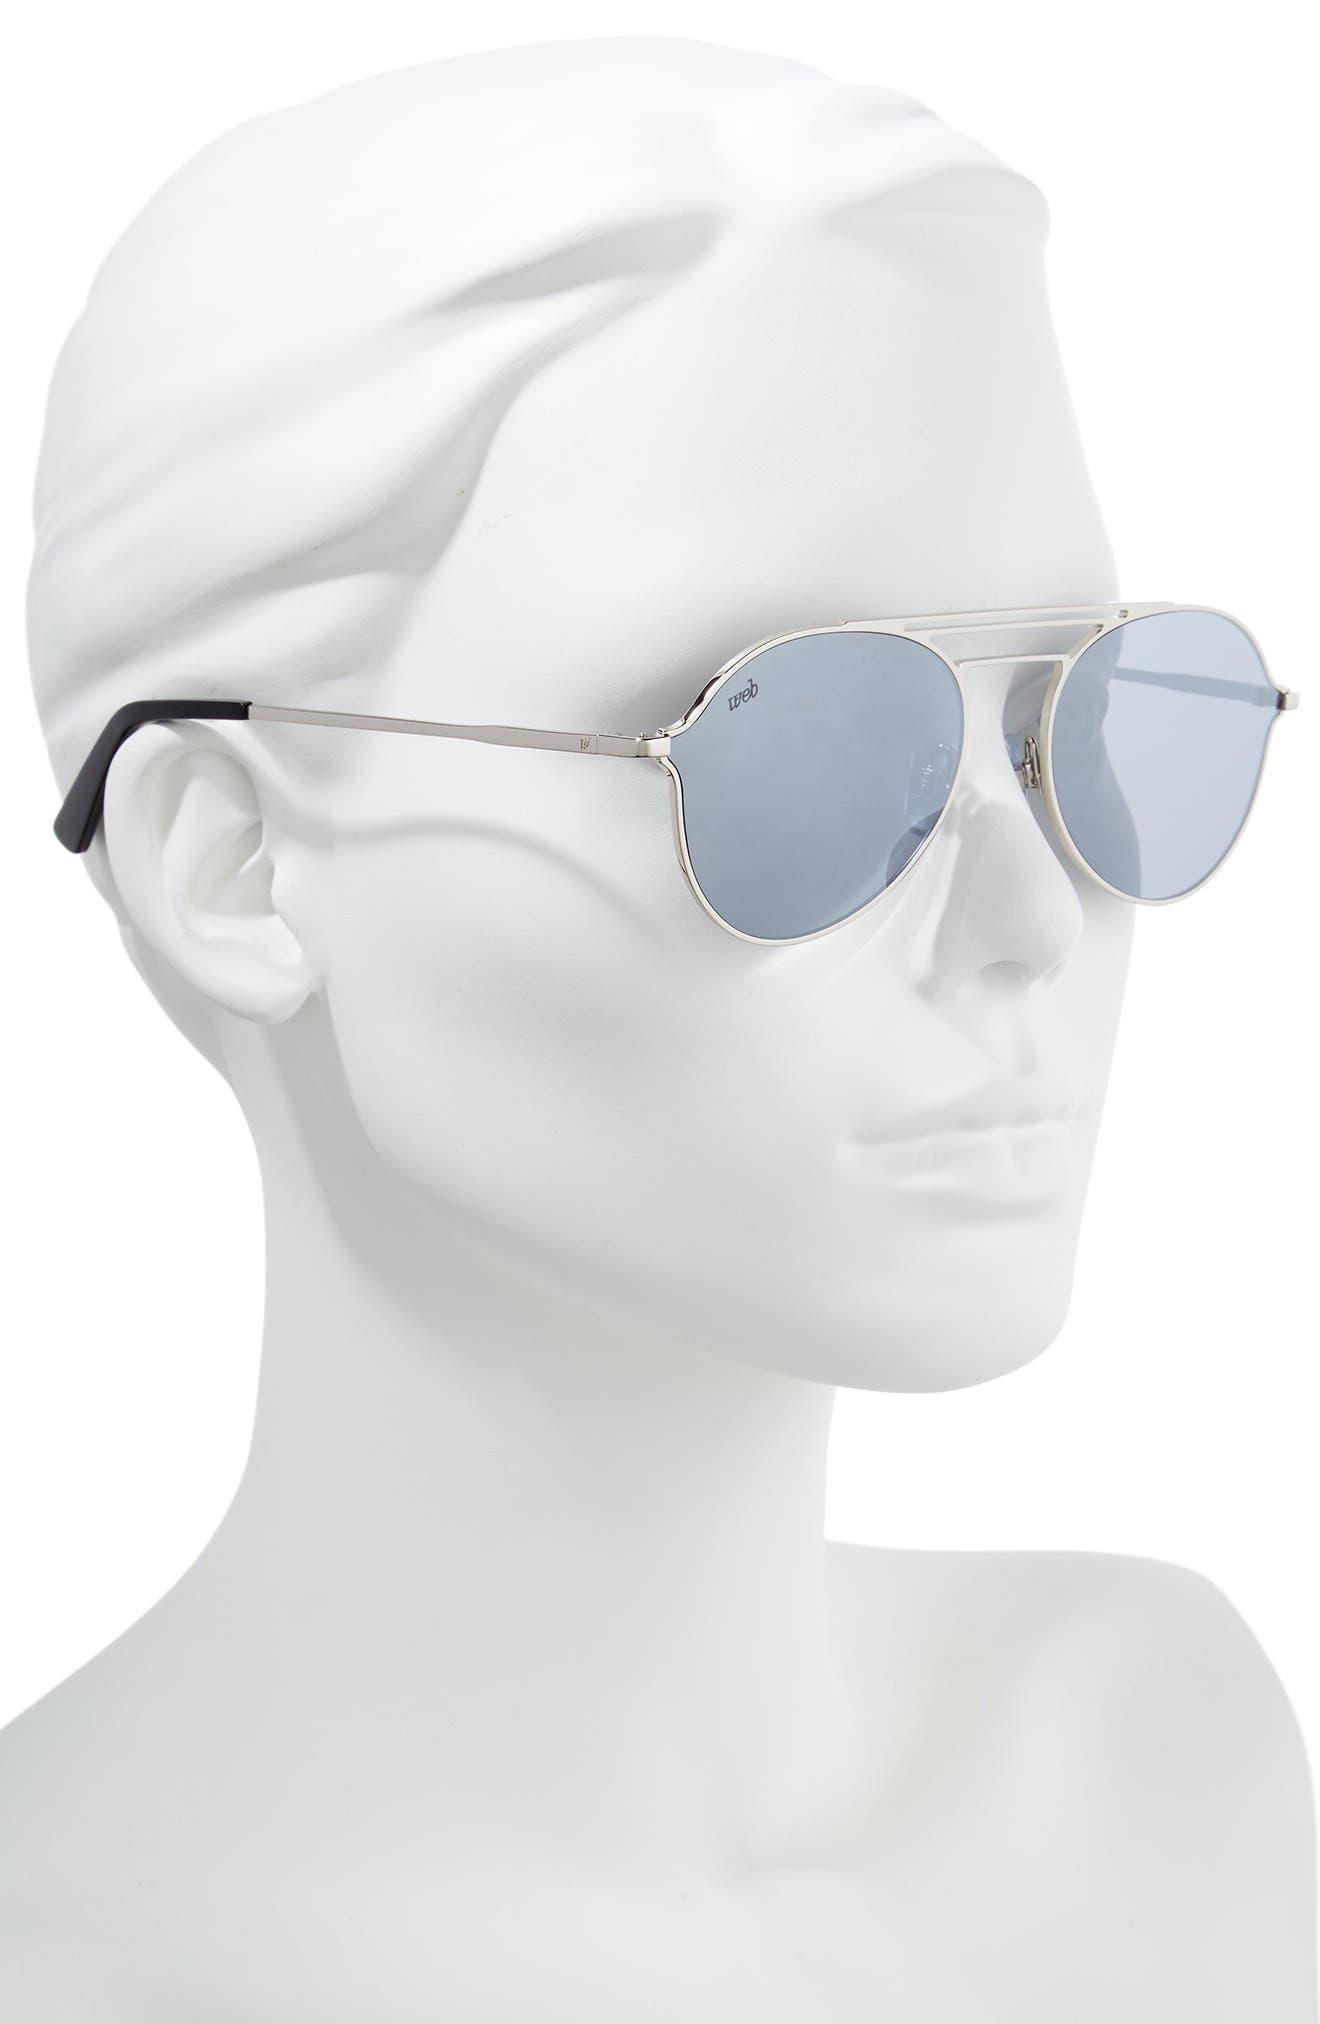 56mm Aviator Sunglasses,                             Alternate thumbnail 2, color,                             Shiny Palladium/ Smoke Mirror